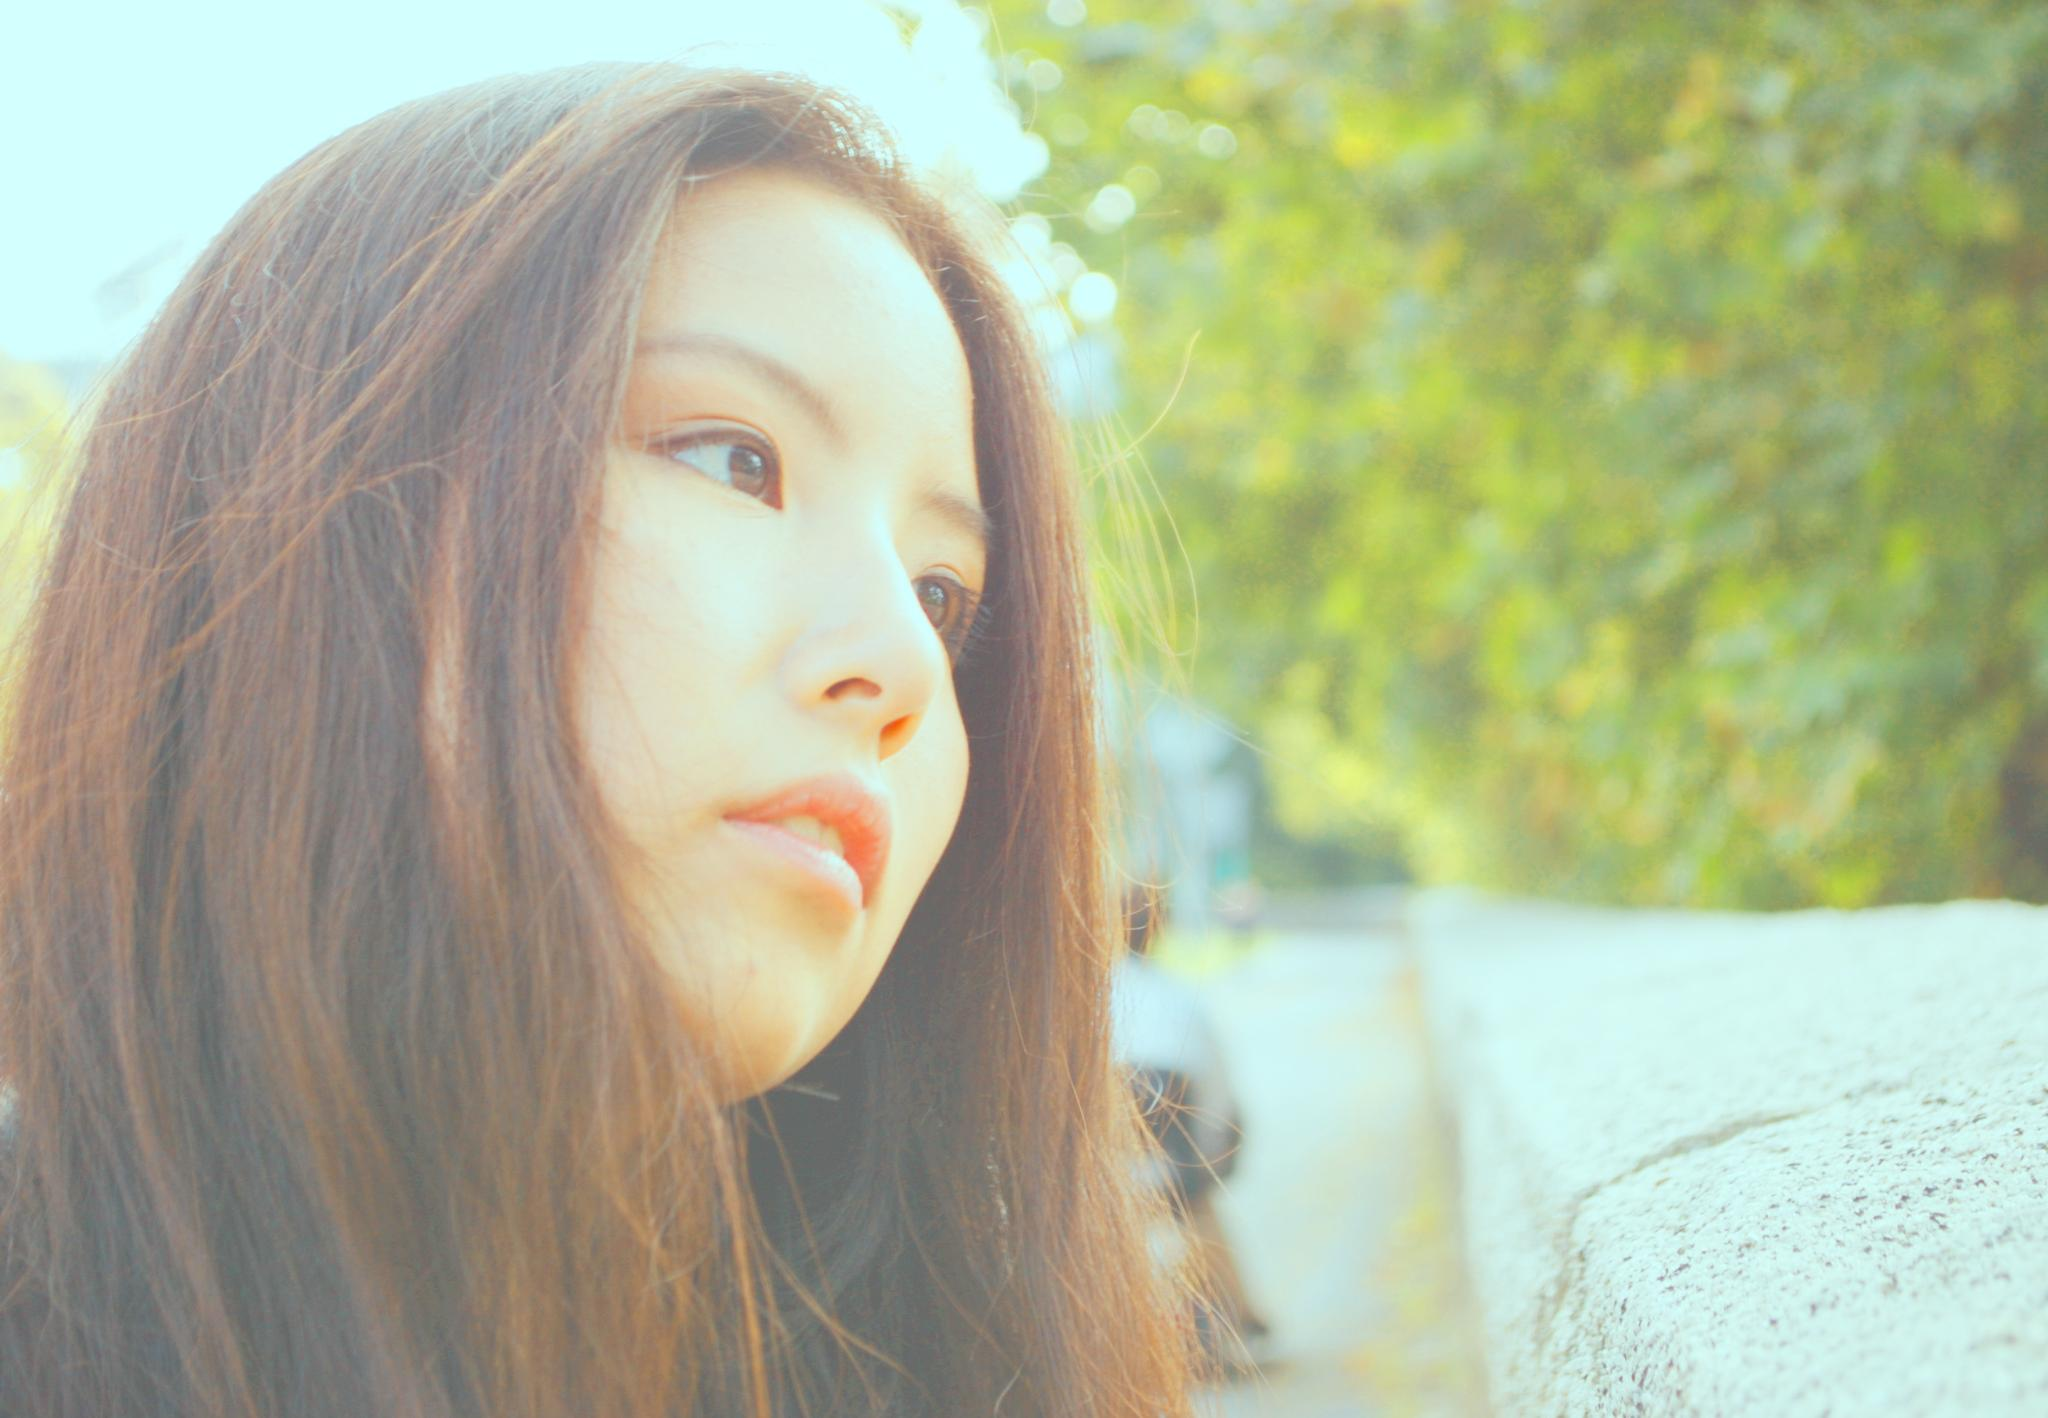 autumn dream by Yoko D